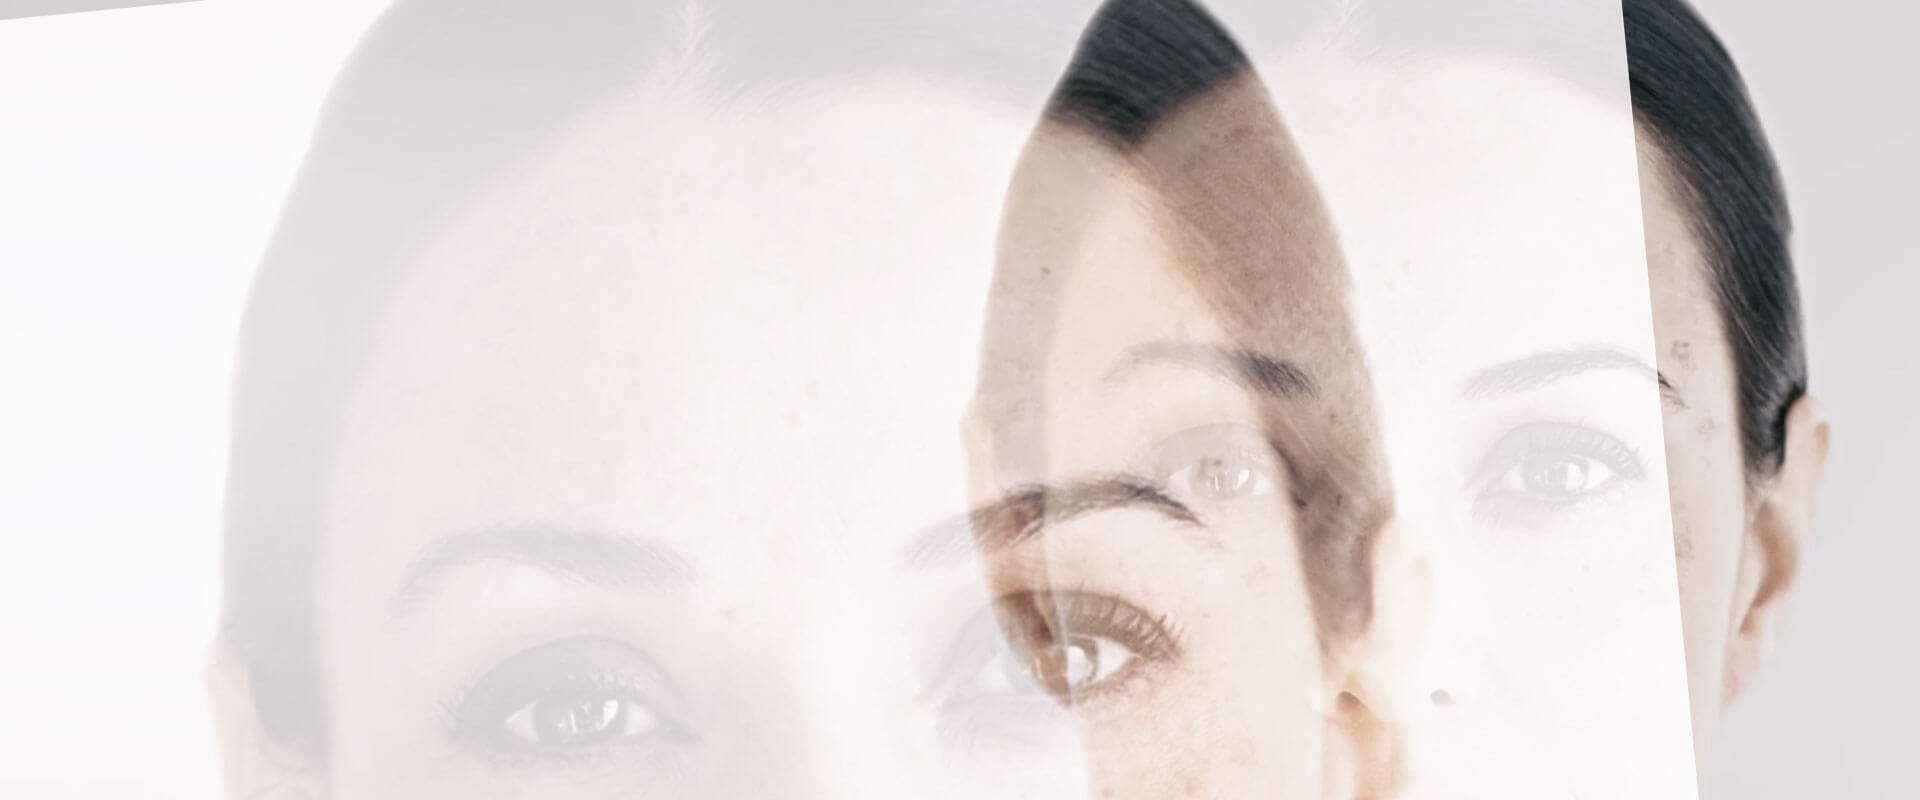 laser genesis featured image